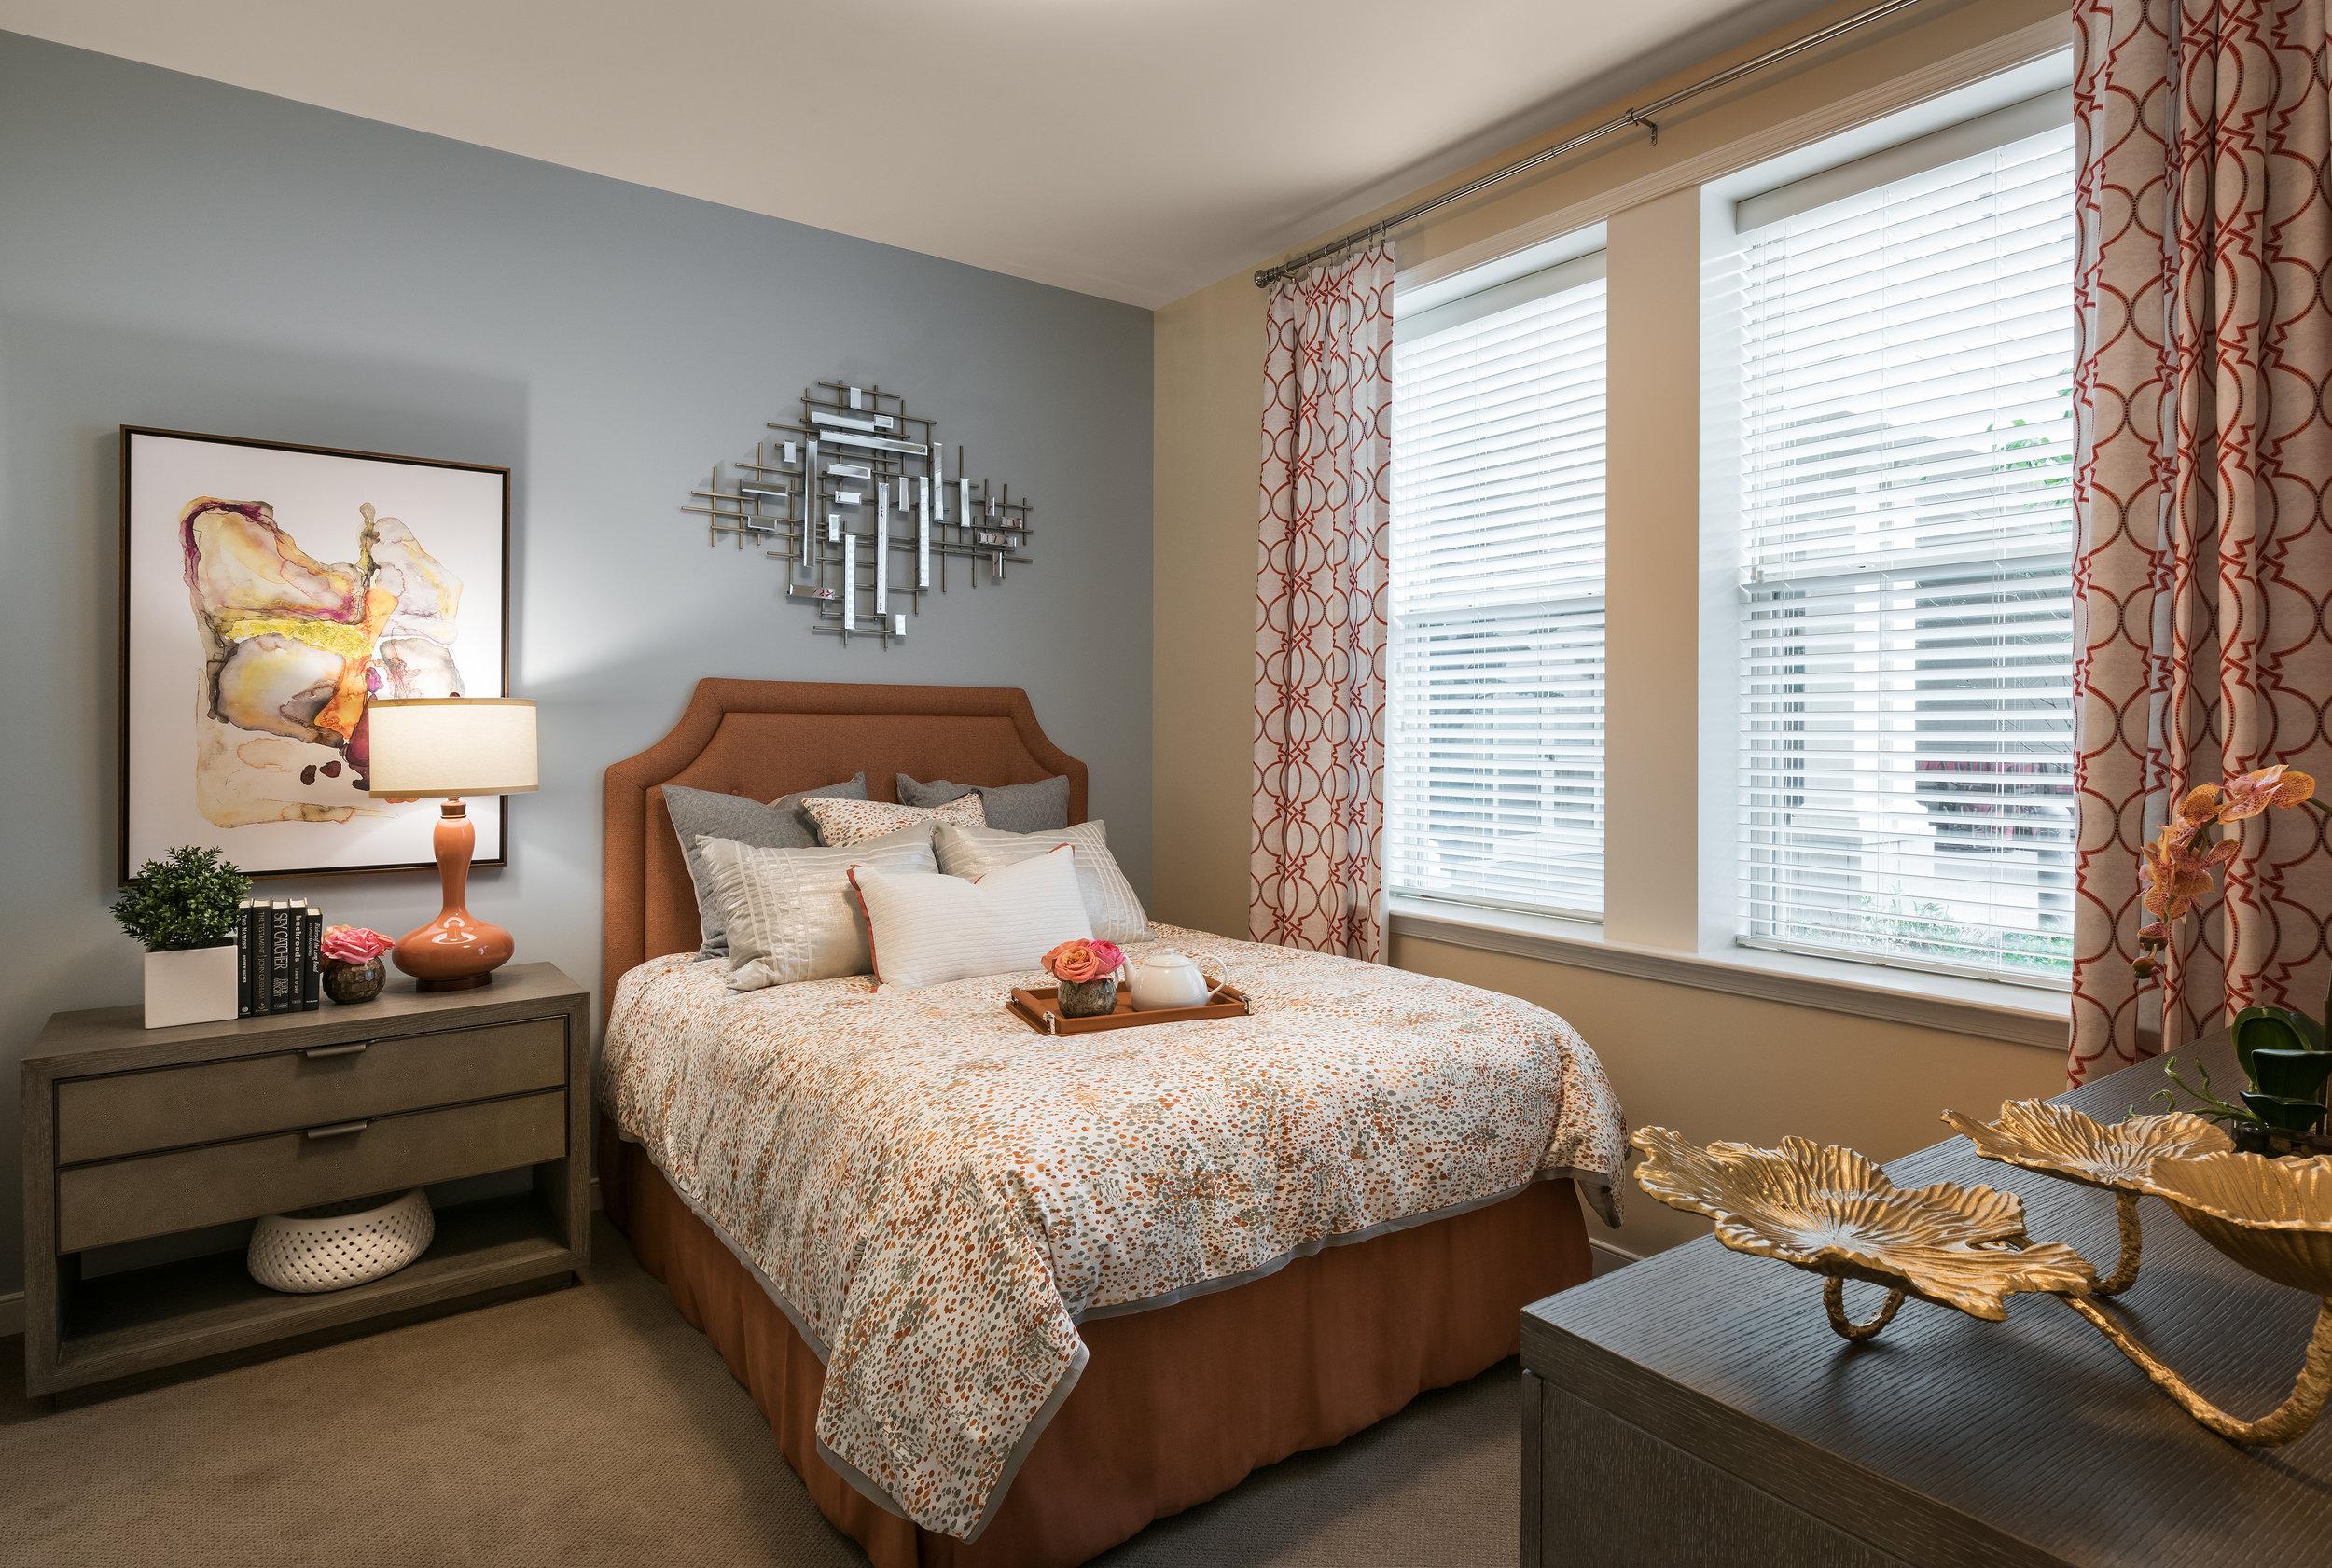 18-056-25 Model 1112 Bedroom.jpeg